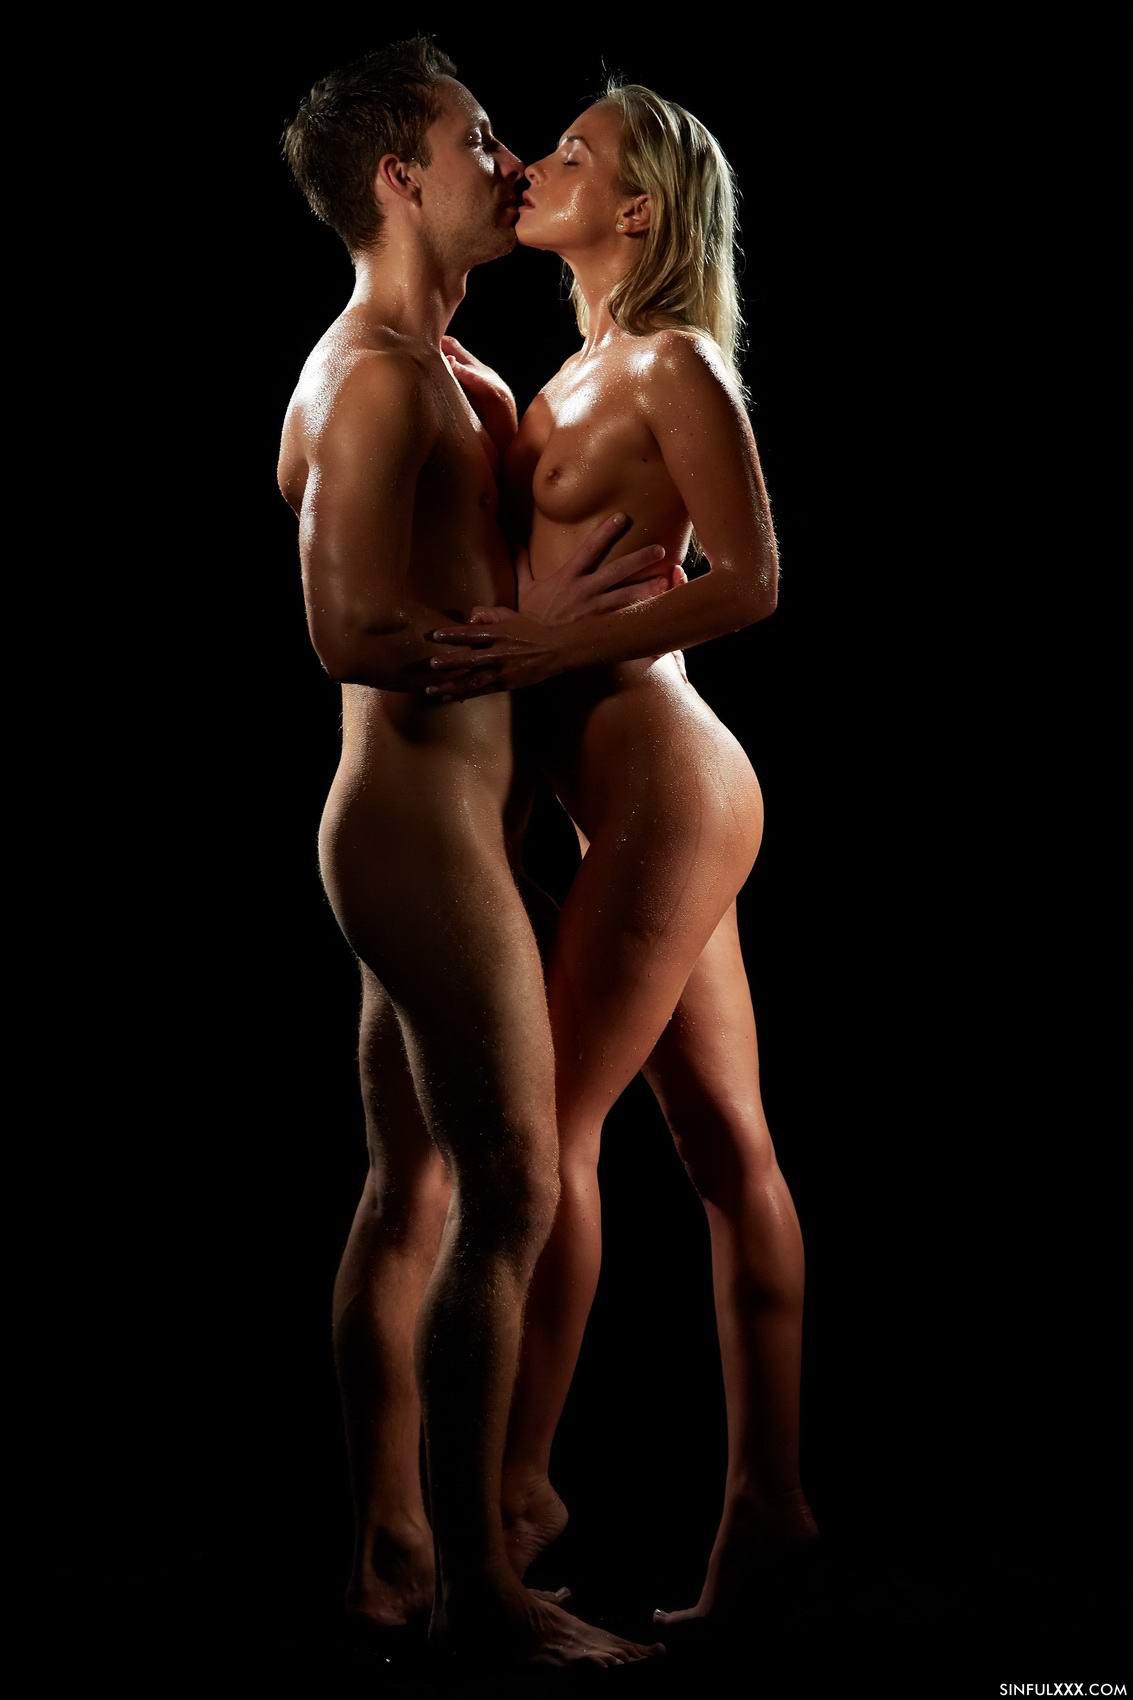 couples best escort forum